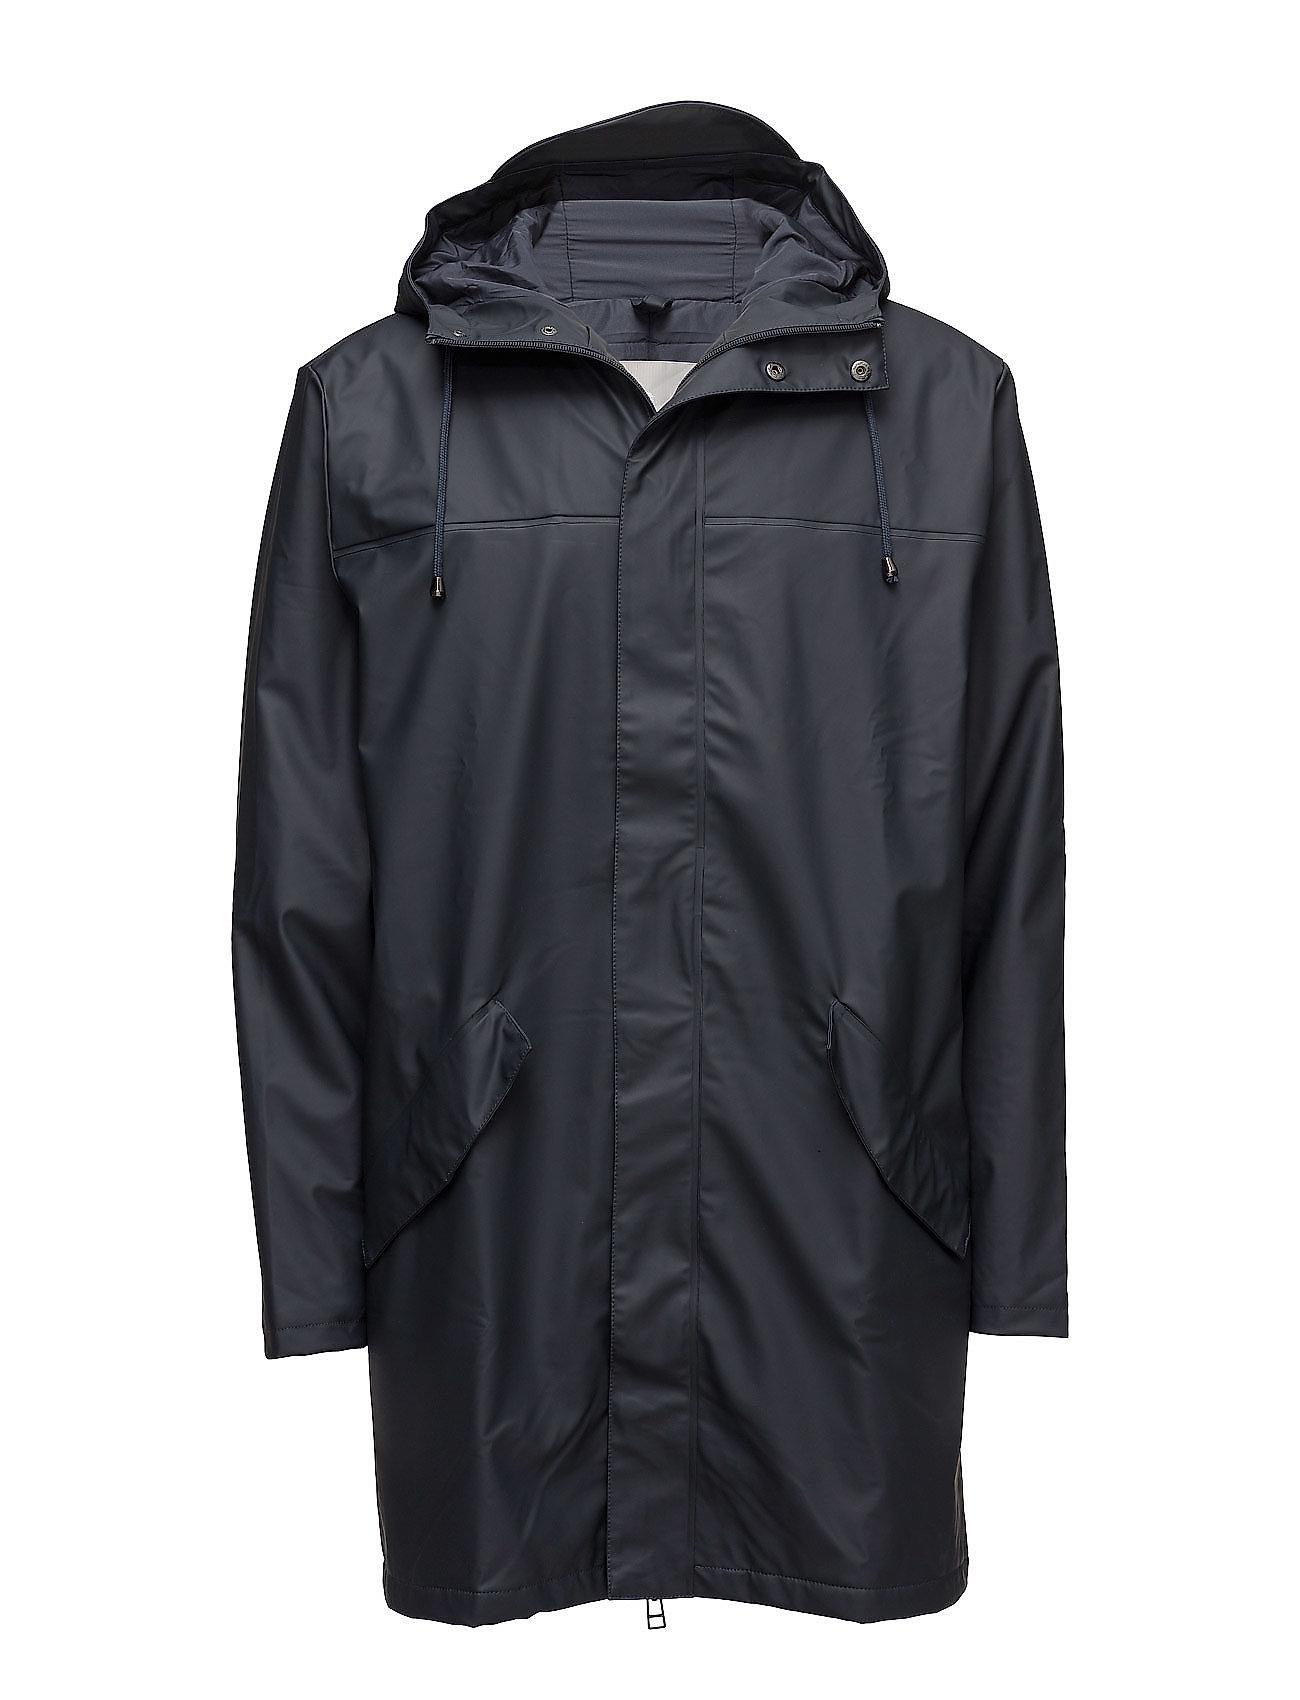 Jacket02 Jacket02 BlueRains Alpine Alpine BlueRains BlueRains Alpine Alpine Jacket02 mNwOPy0v8n